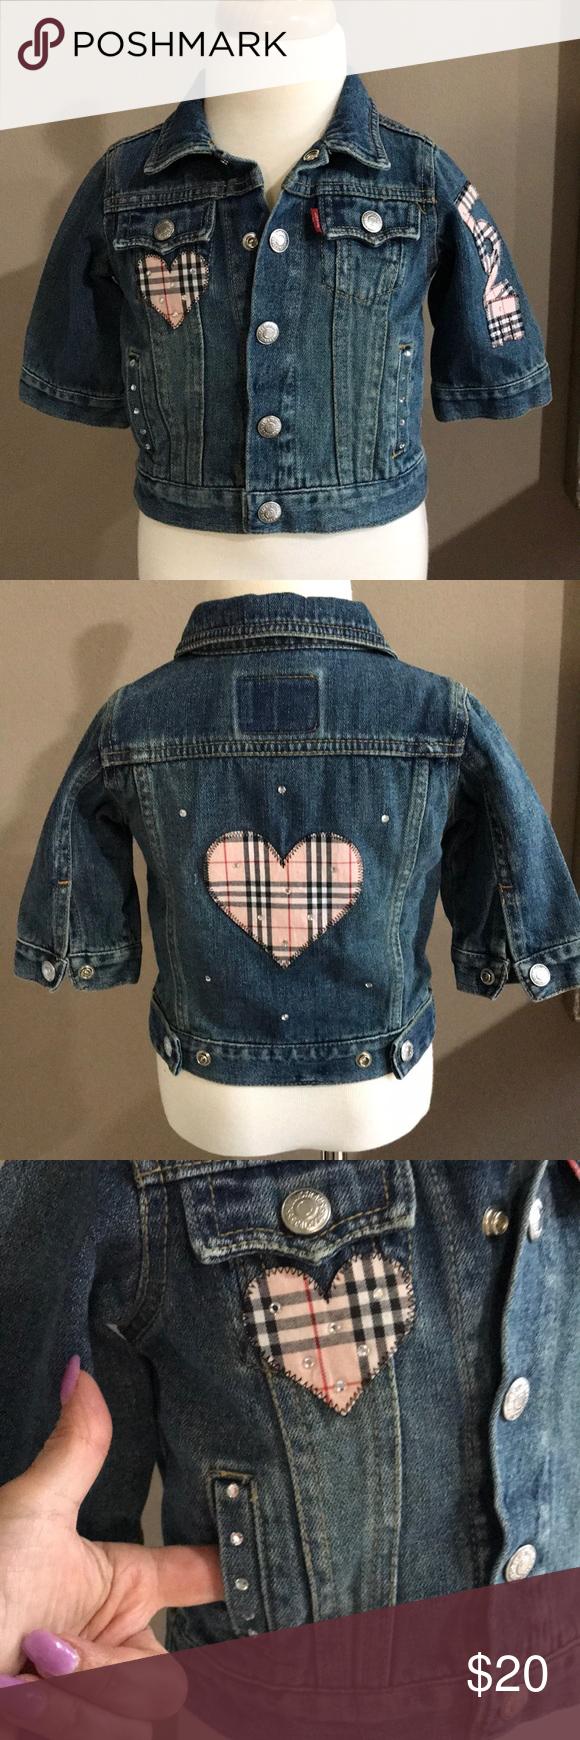 Levi S Baby Girl Denim Embellished Trucker Jacket Girls Denim Jackets Trucker Jacket [ 1740 x 580 Pixel ]